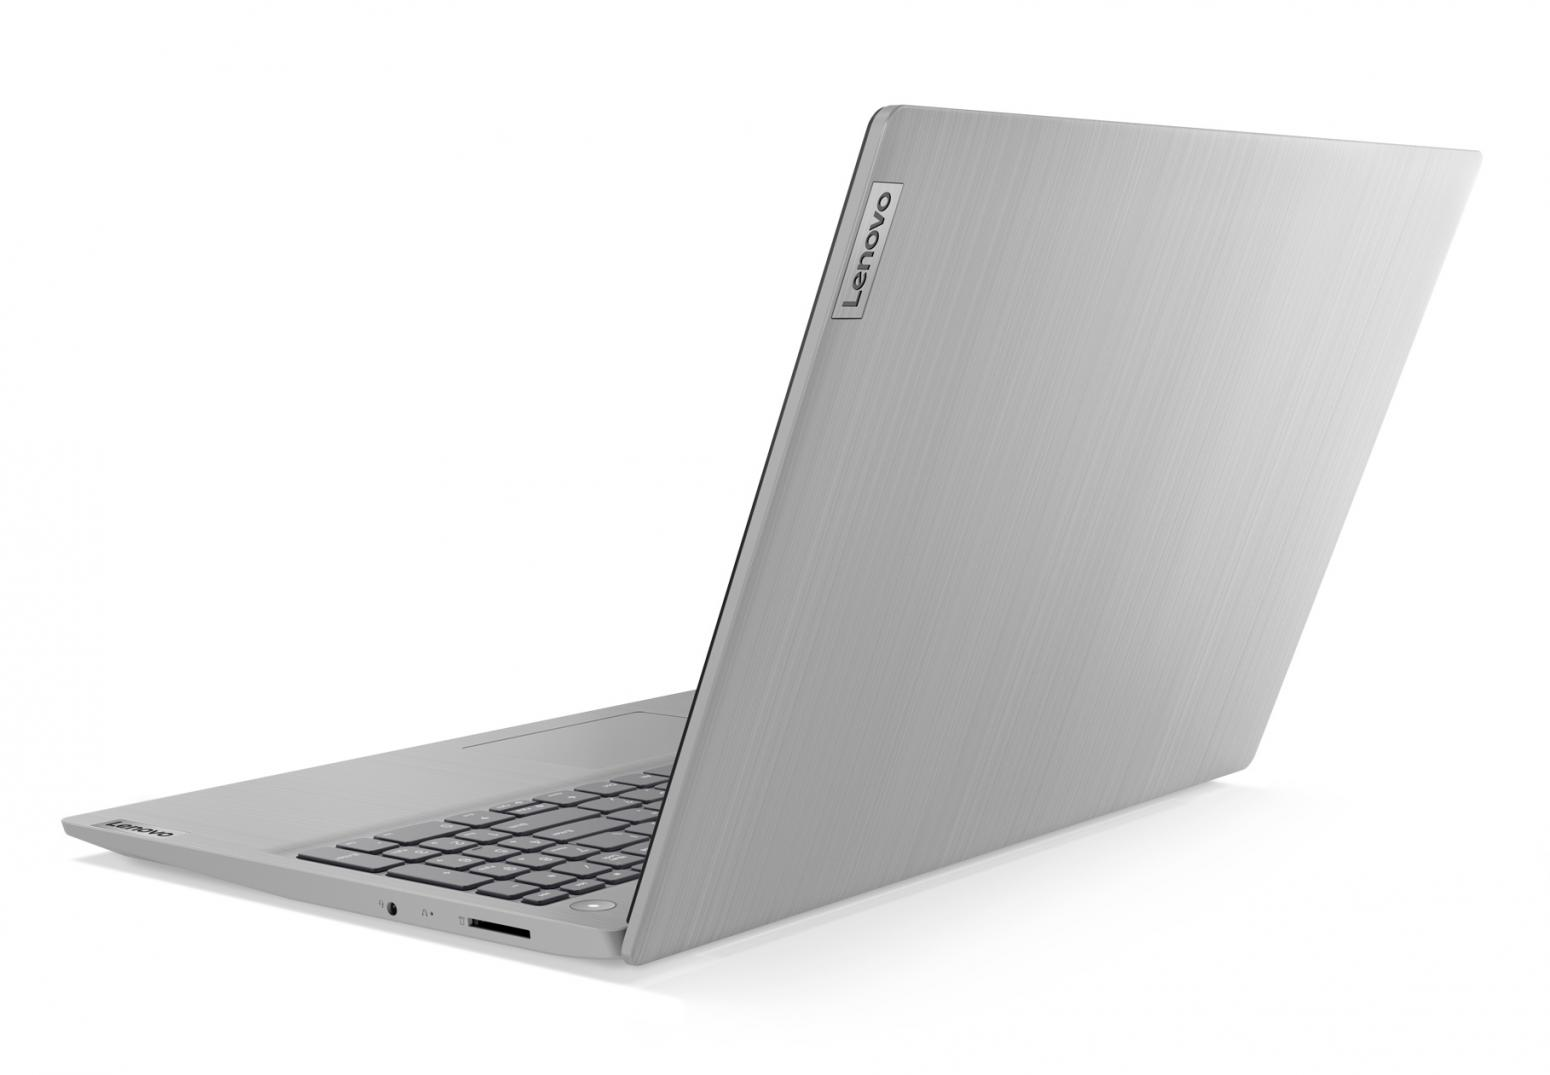 Ordinateur portable Lenovo IdeaPad 3 15ADA05 (81W1002FFR) Argent - photo 9